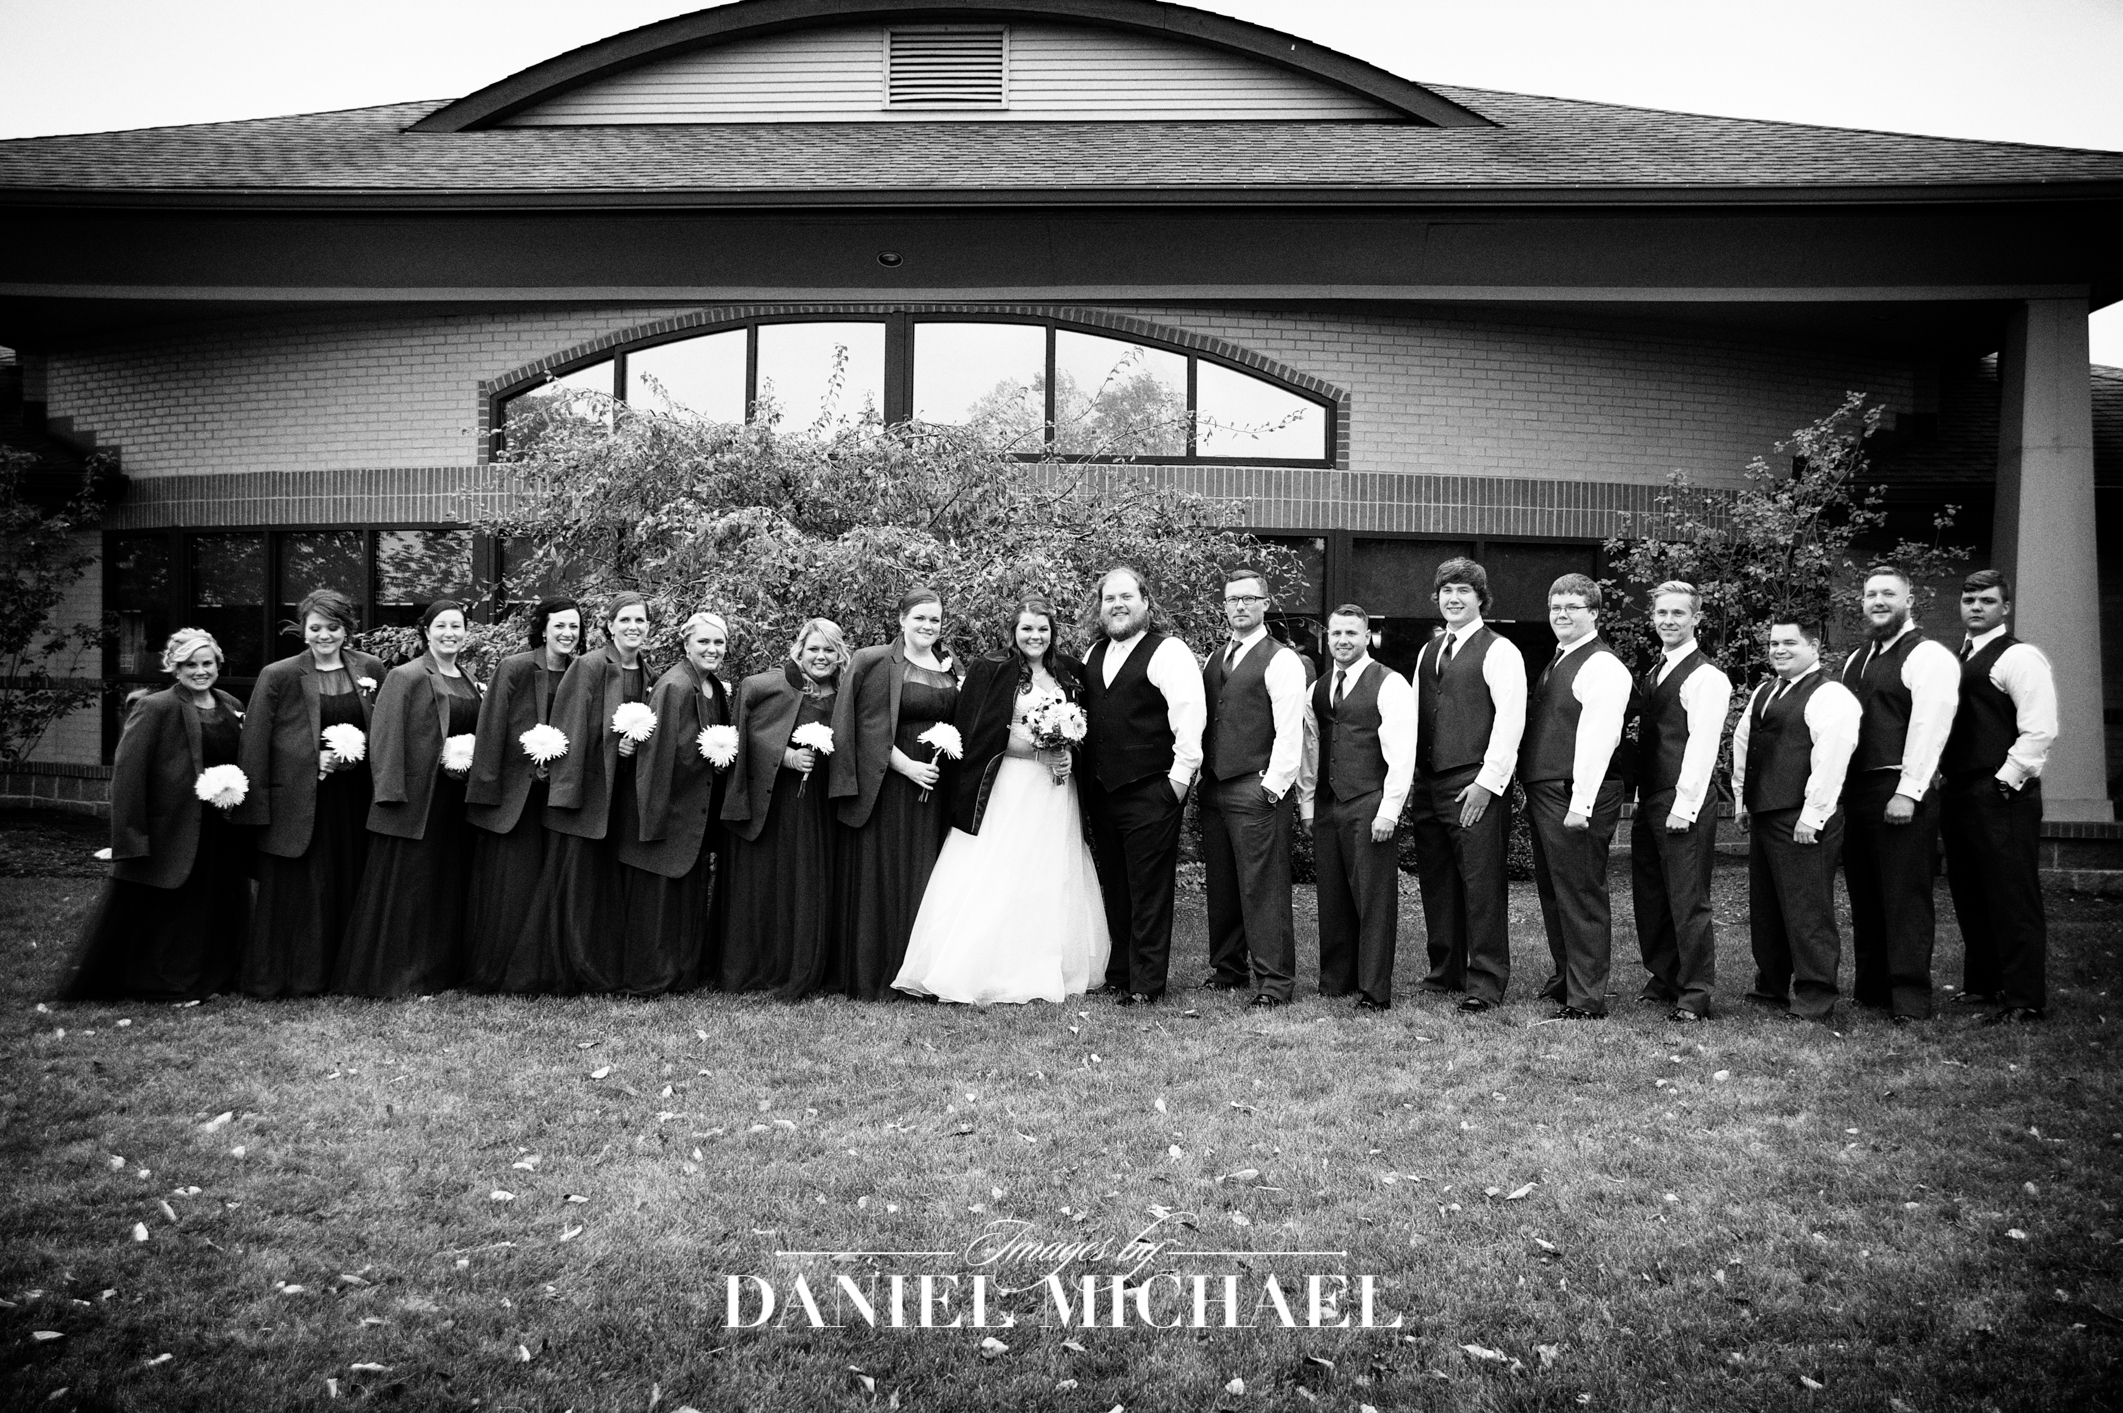 Beavercreek Golf Ceremony Wedding Photography Venue